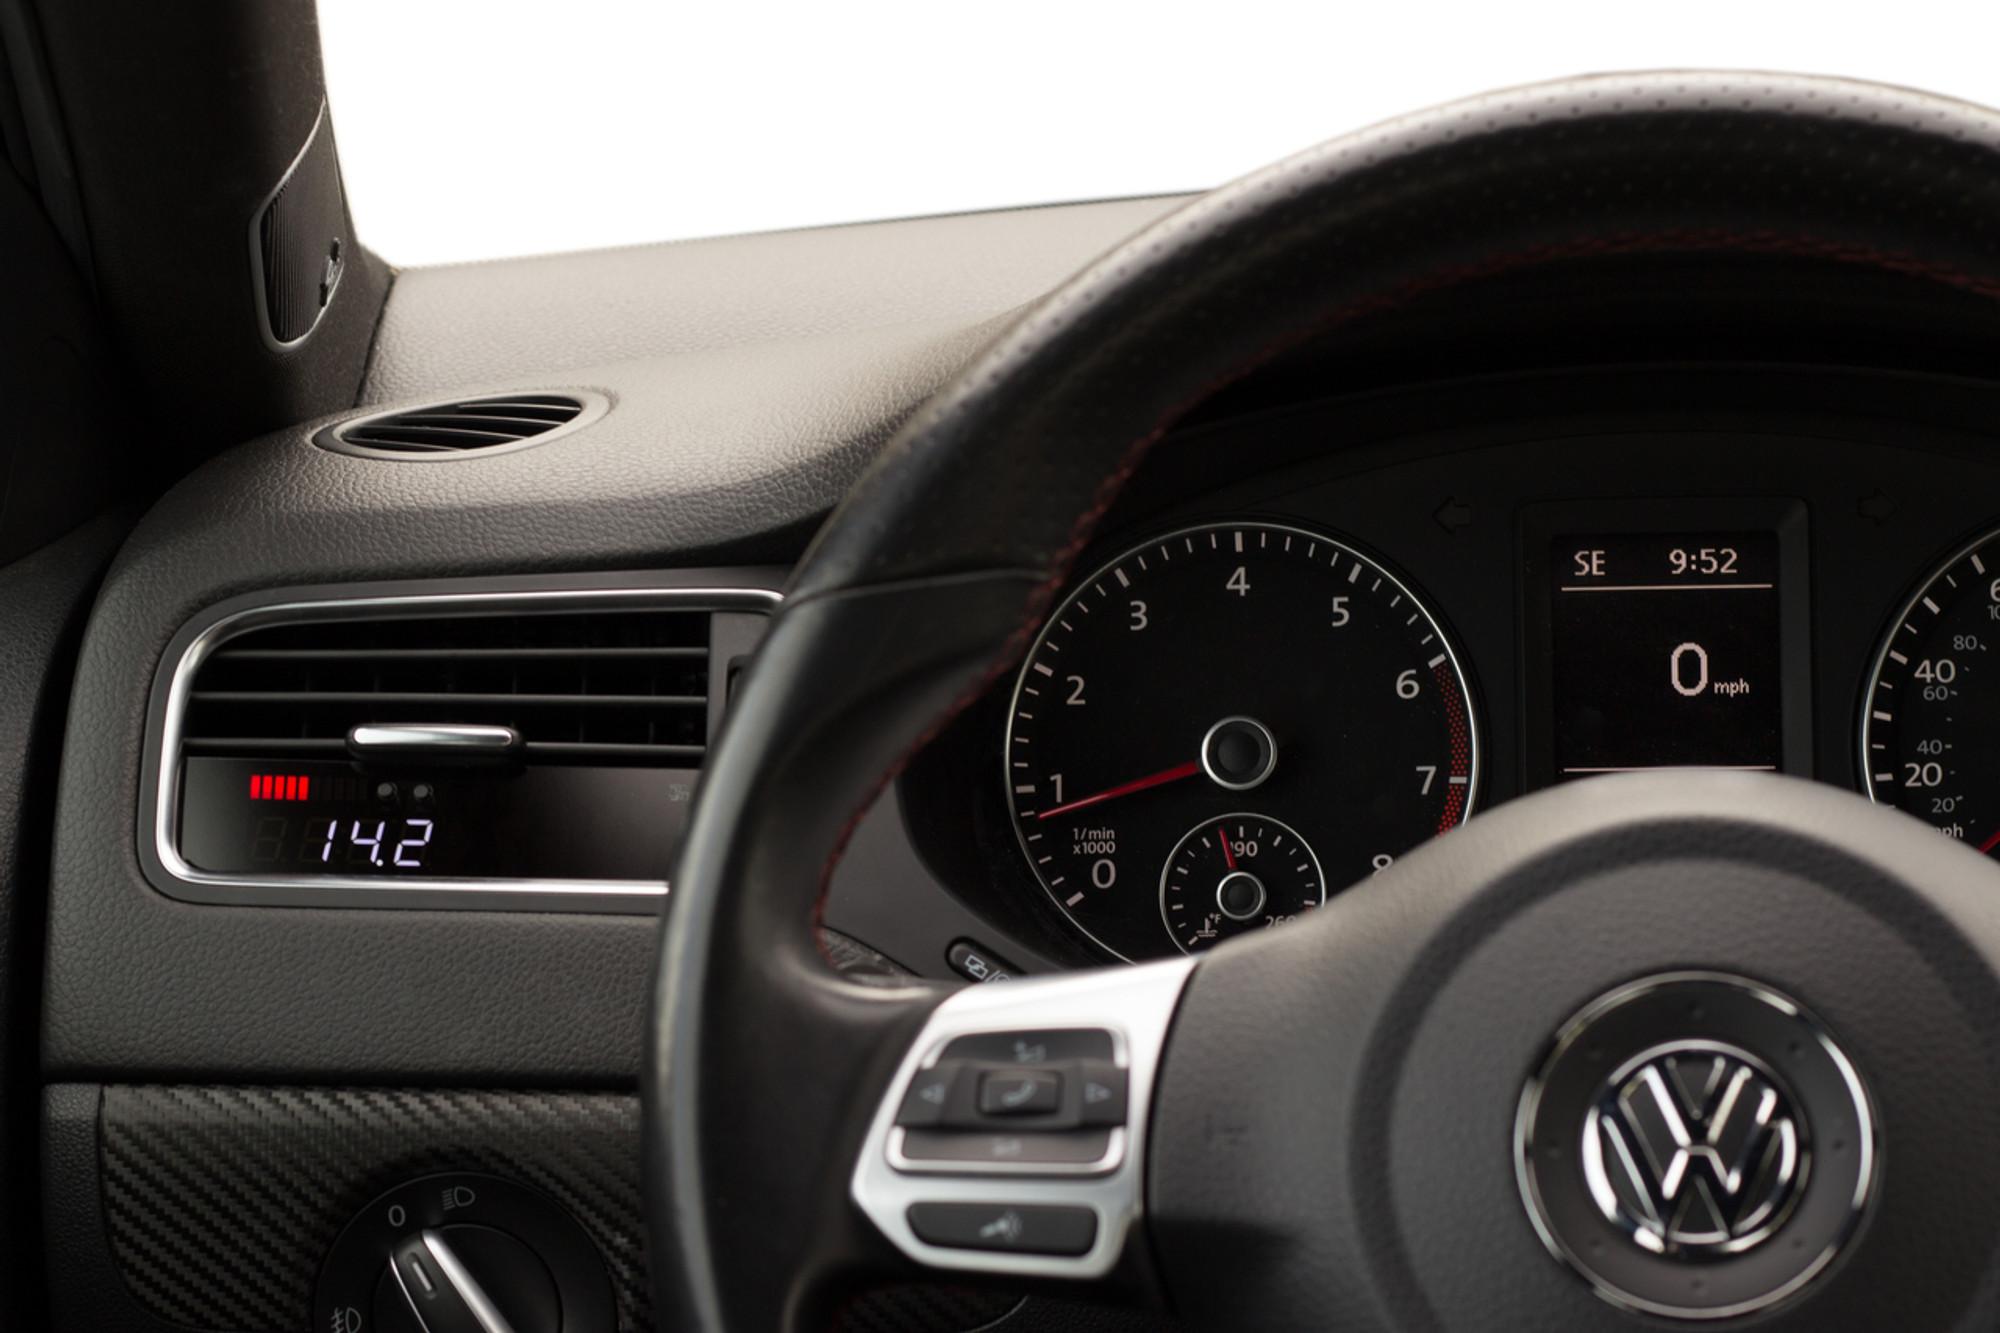 VW MK6 Jetta / GLI - P3 OBD2 Multi-Gauge Jetta Wiring Harness Recall on hyundai recall, bmw recall, toyota recall, vw recall,